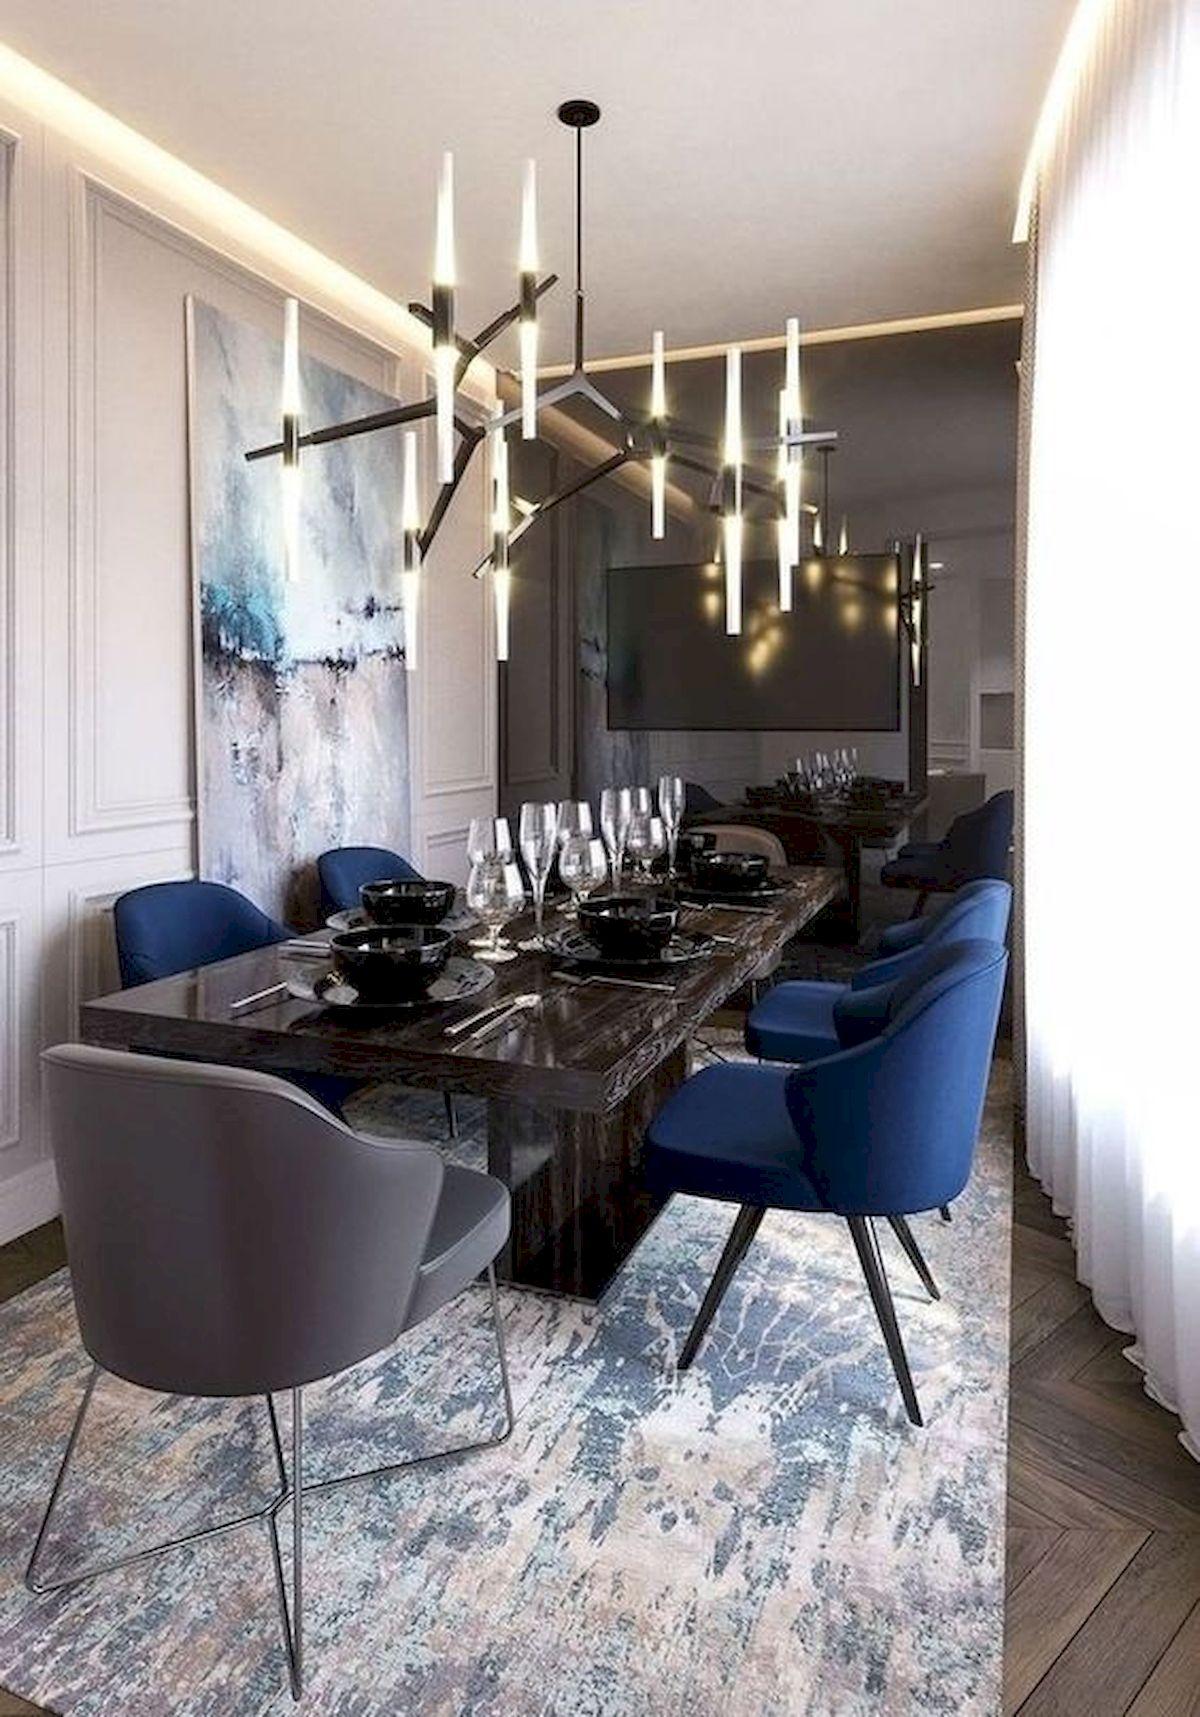 80 Elegant Modern Dining Room Design And Decor Ideas (9)